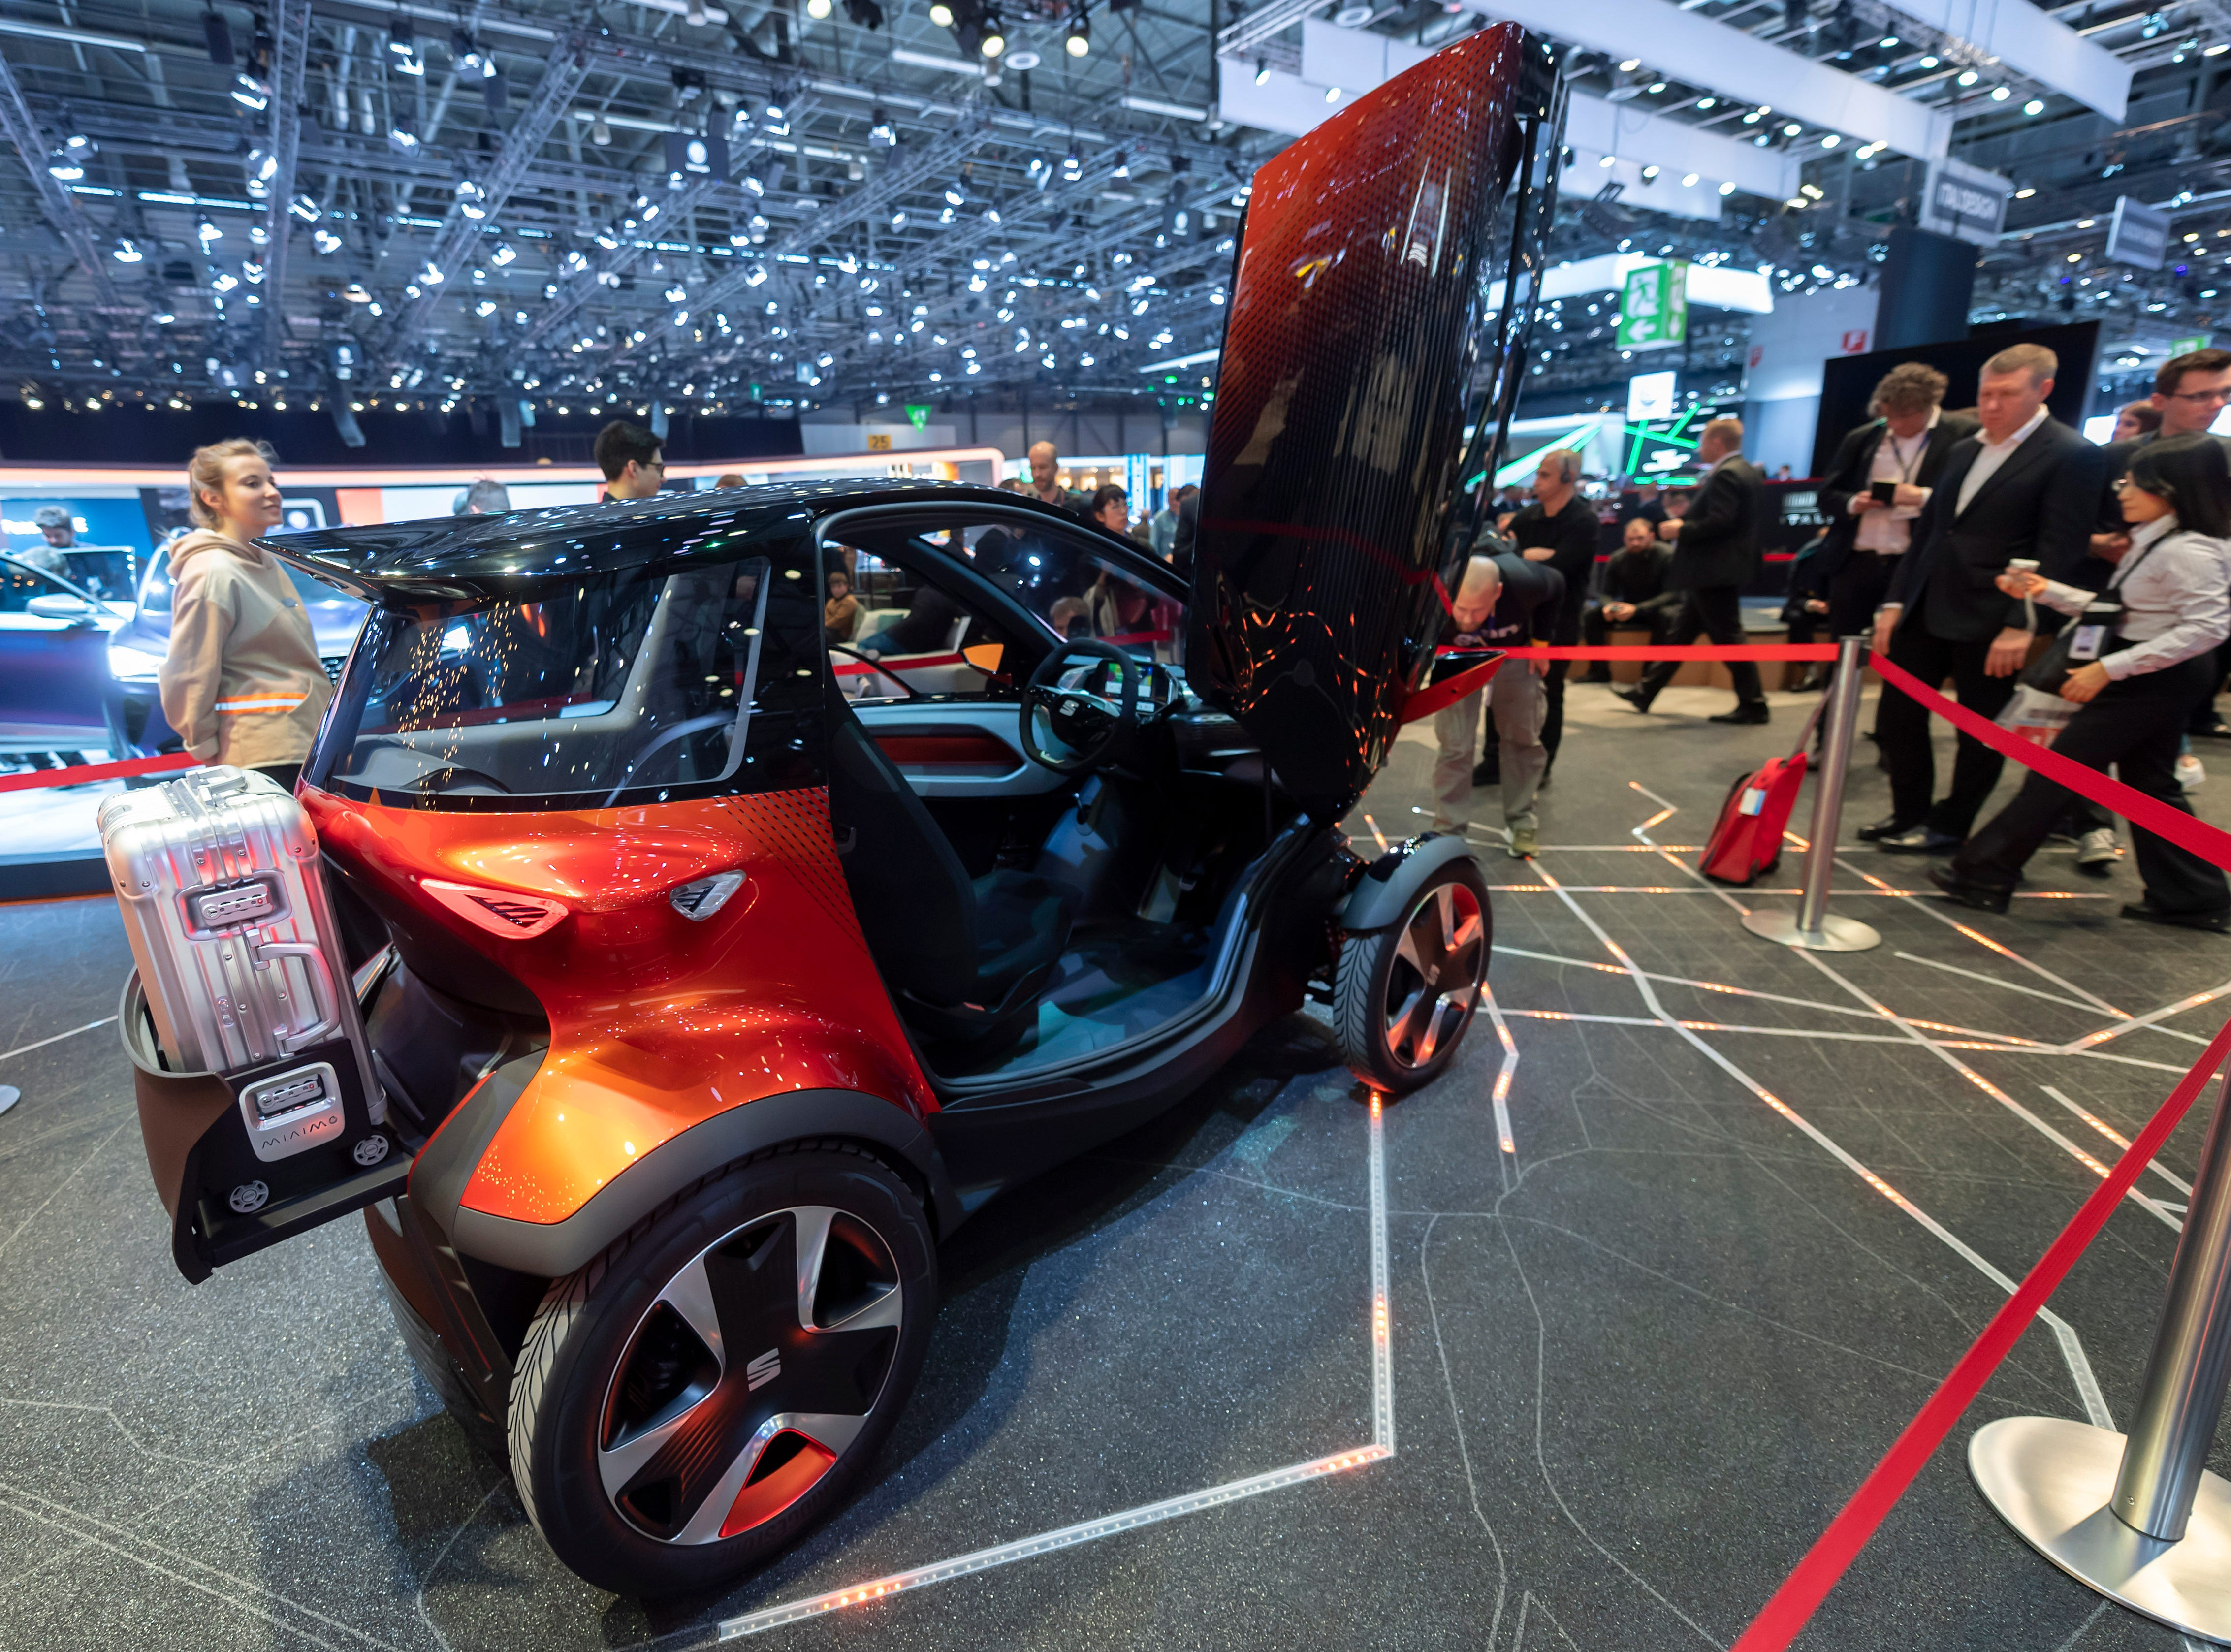 The Seat Minimo  mini-car attracts attention.